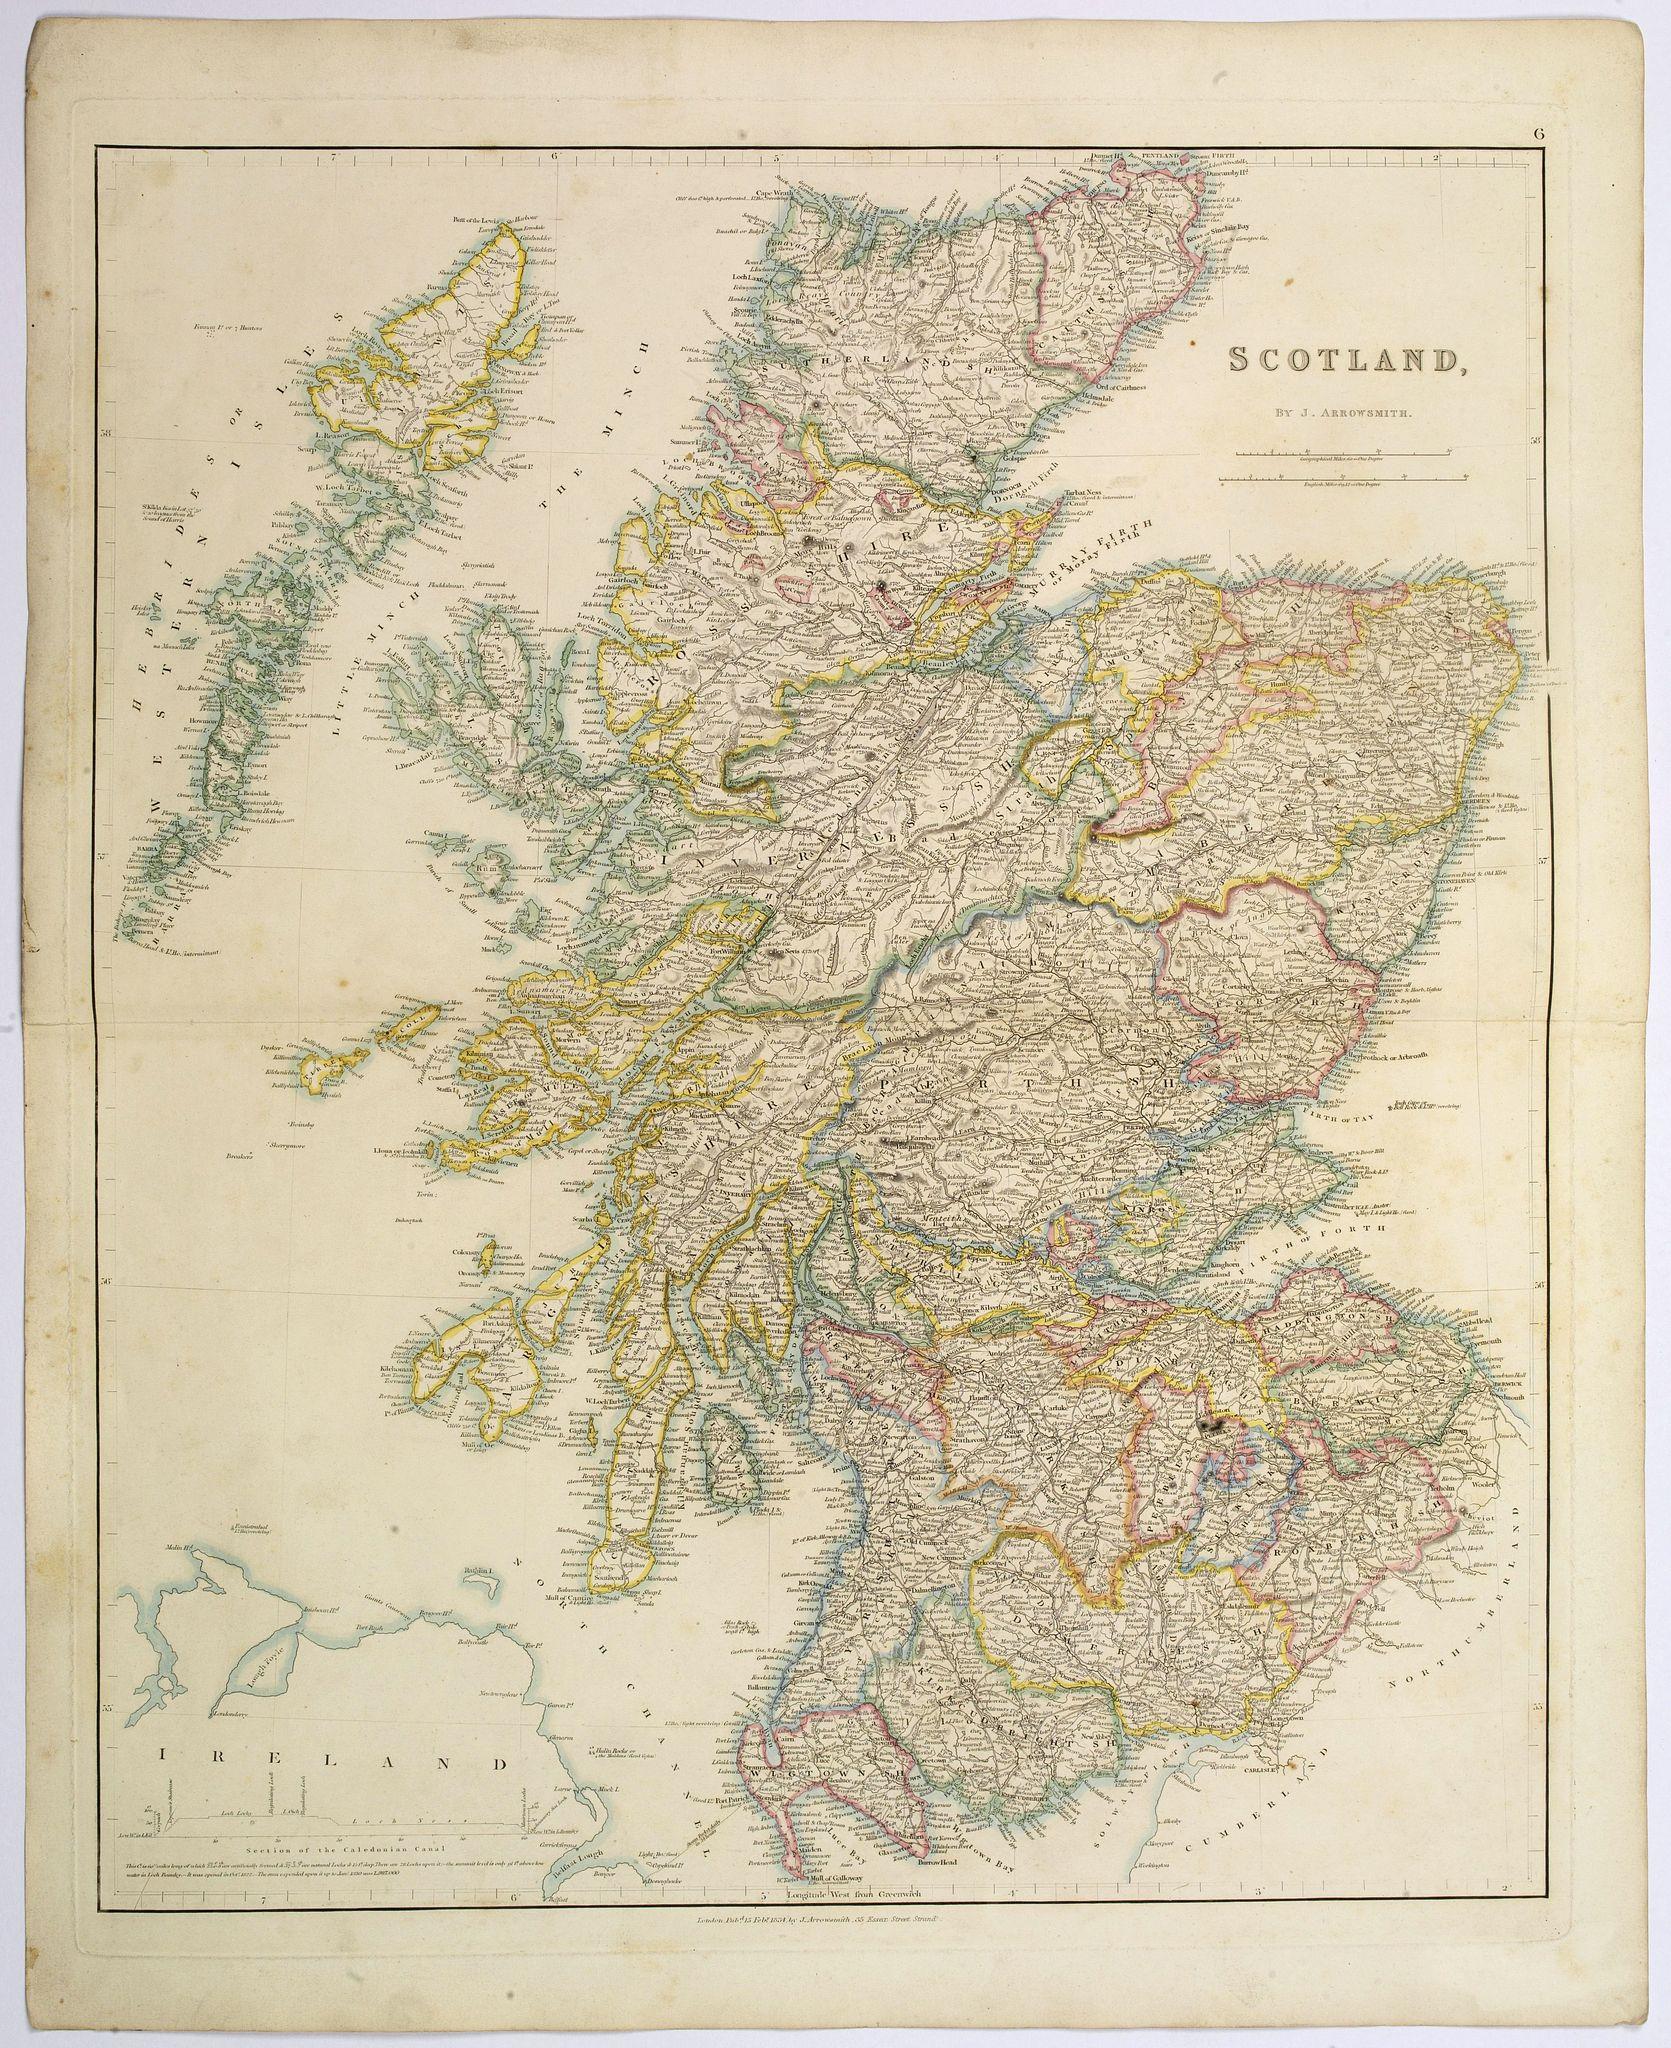 ARROWSMITH, John -  Scotland.